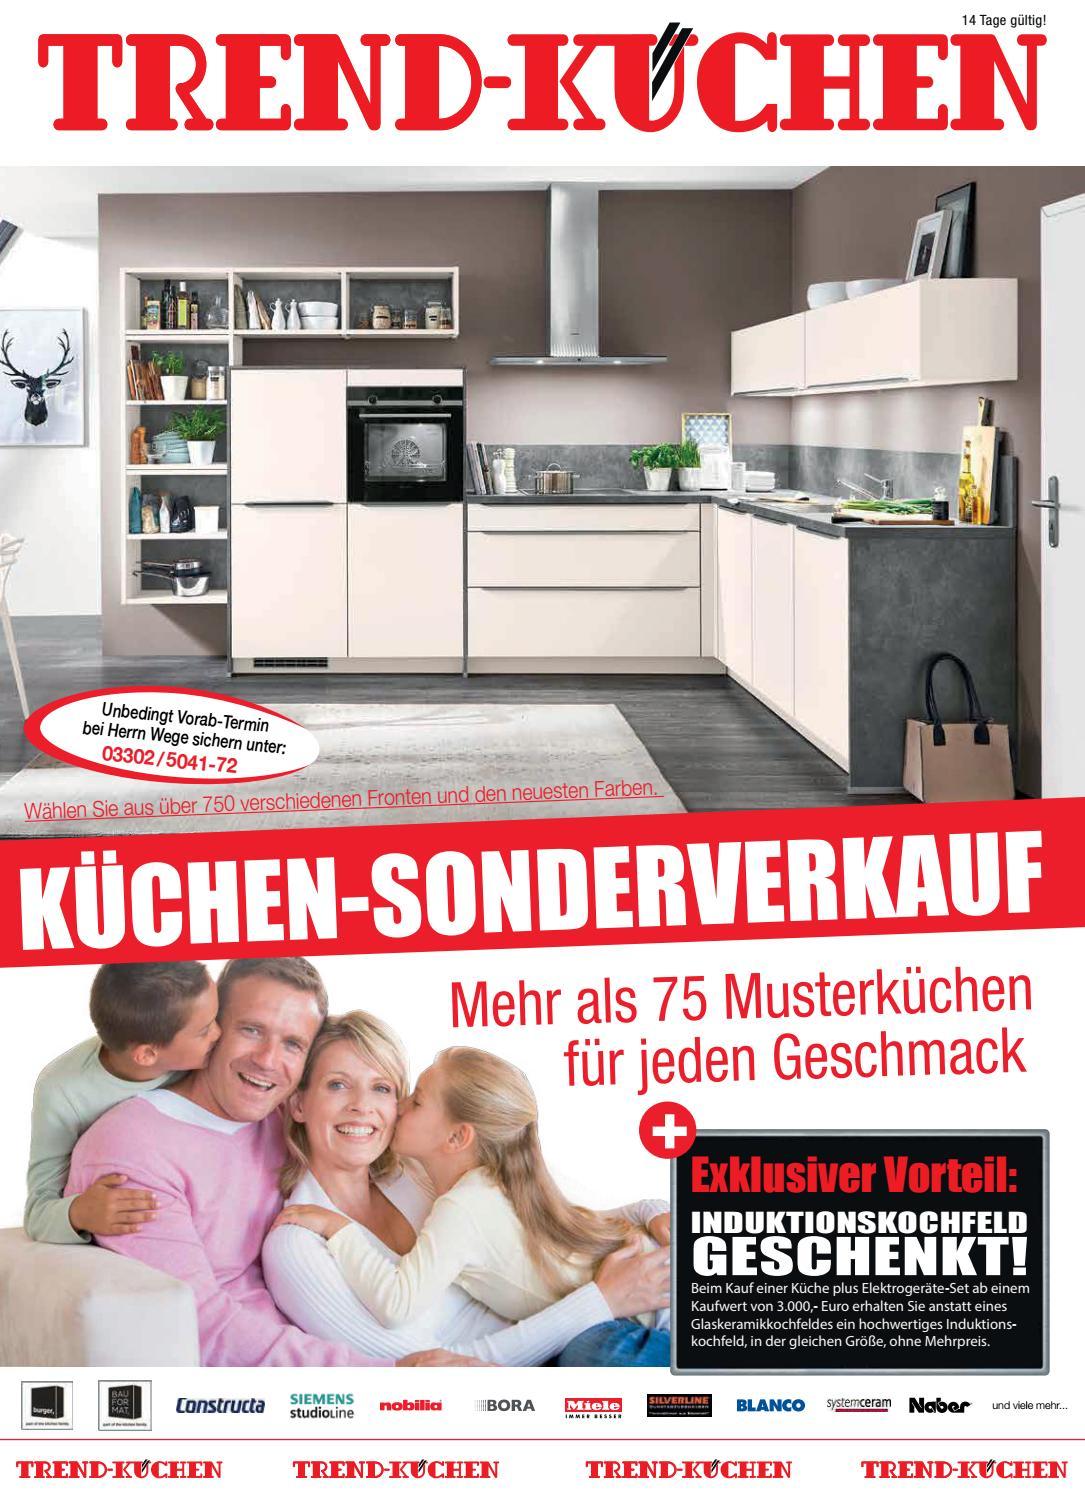 Frey Kuchen Abverkauf Kuche Ausstellungsstuck Wien